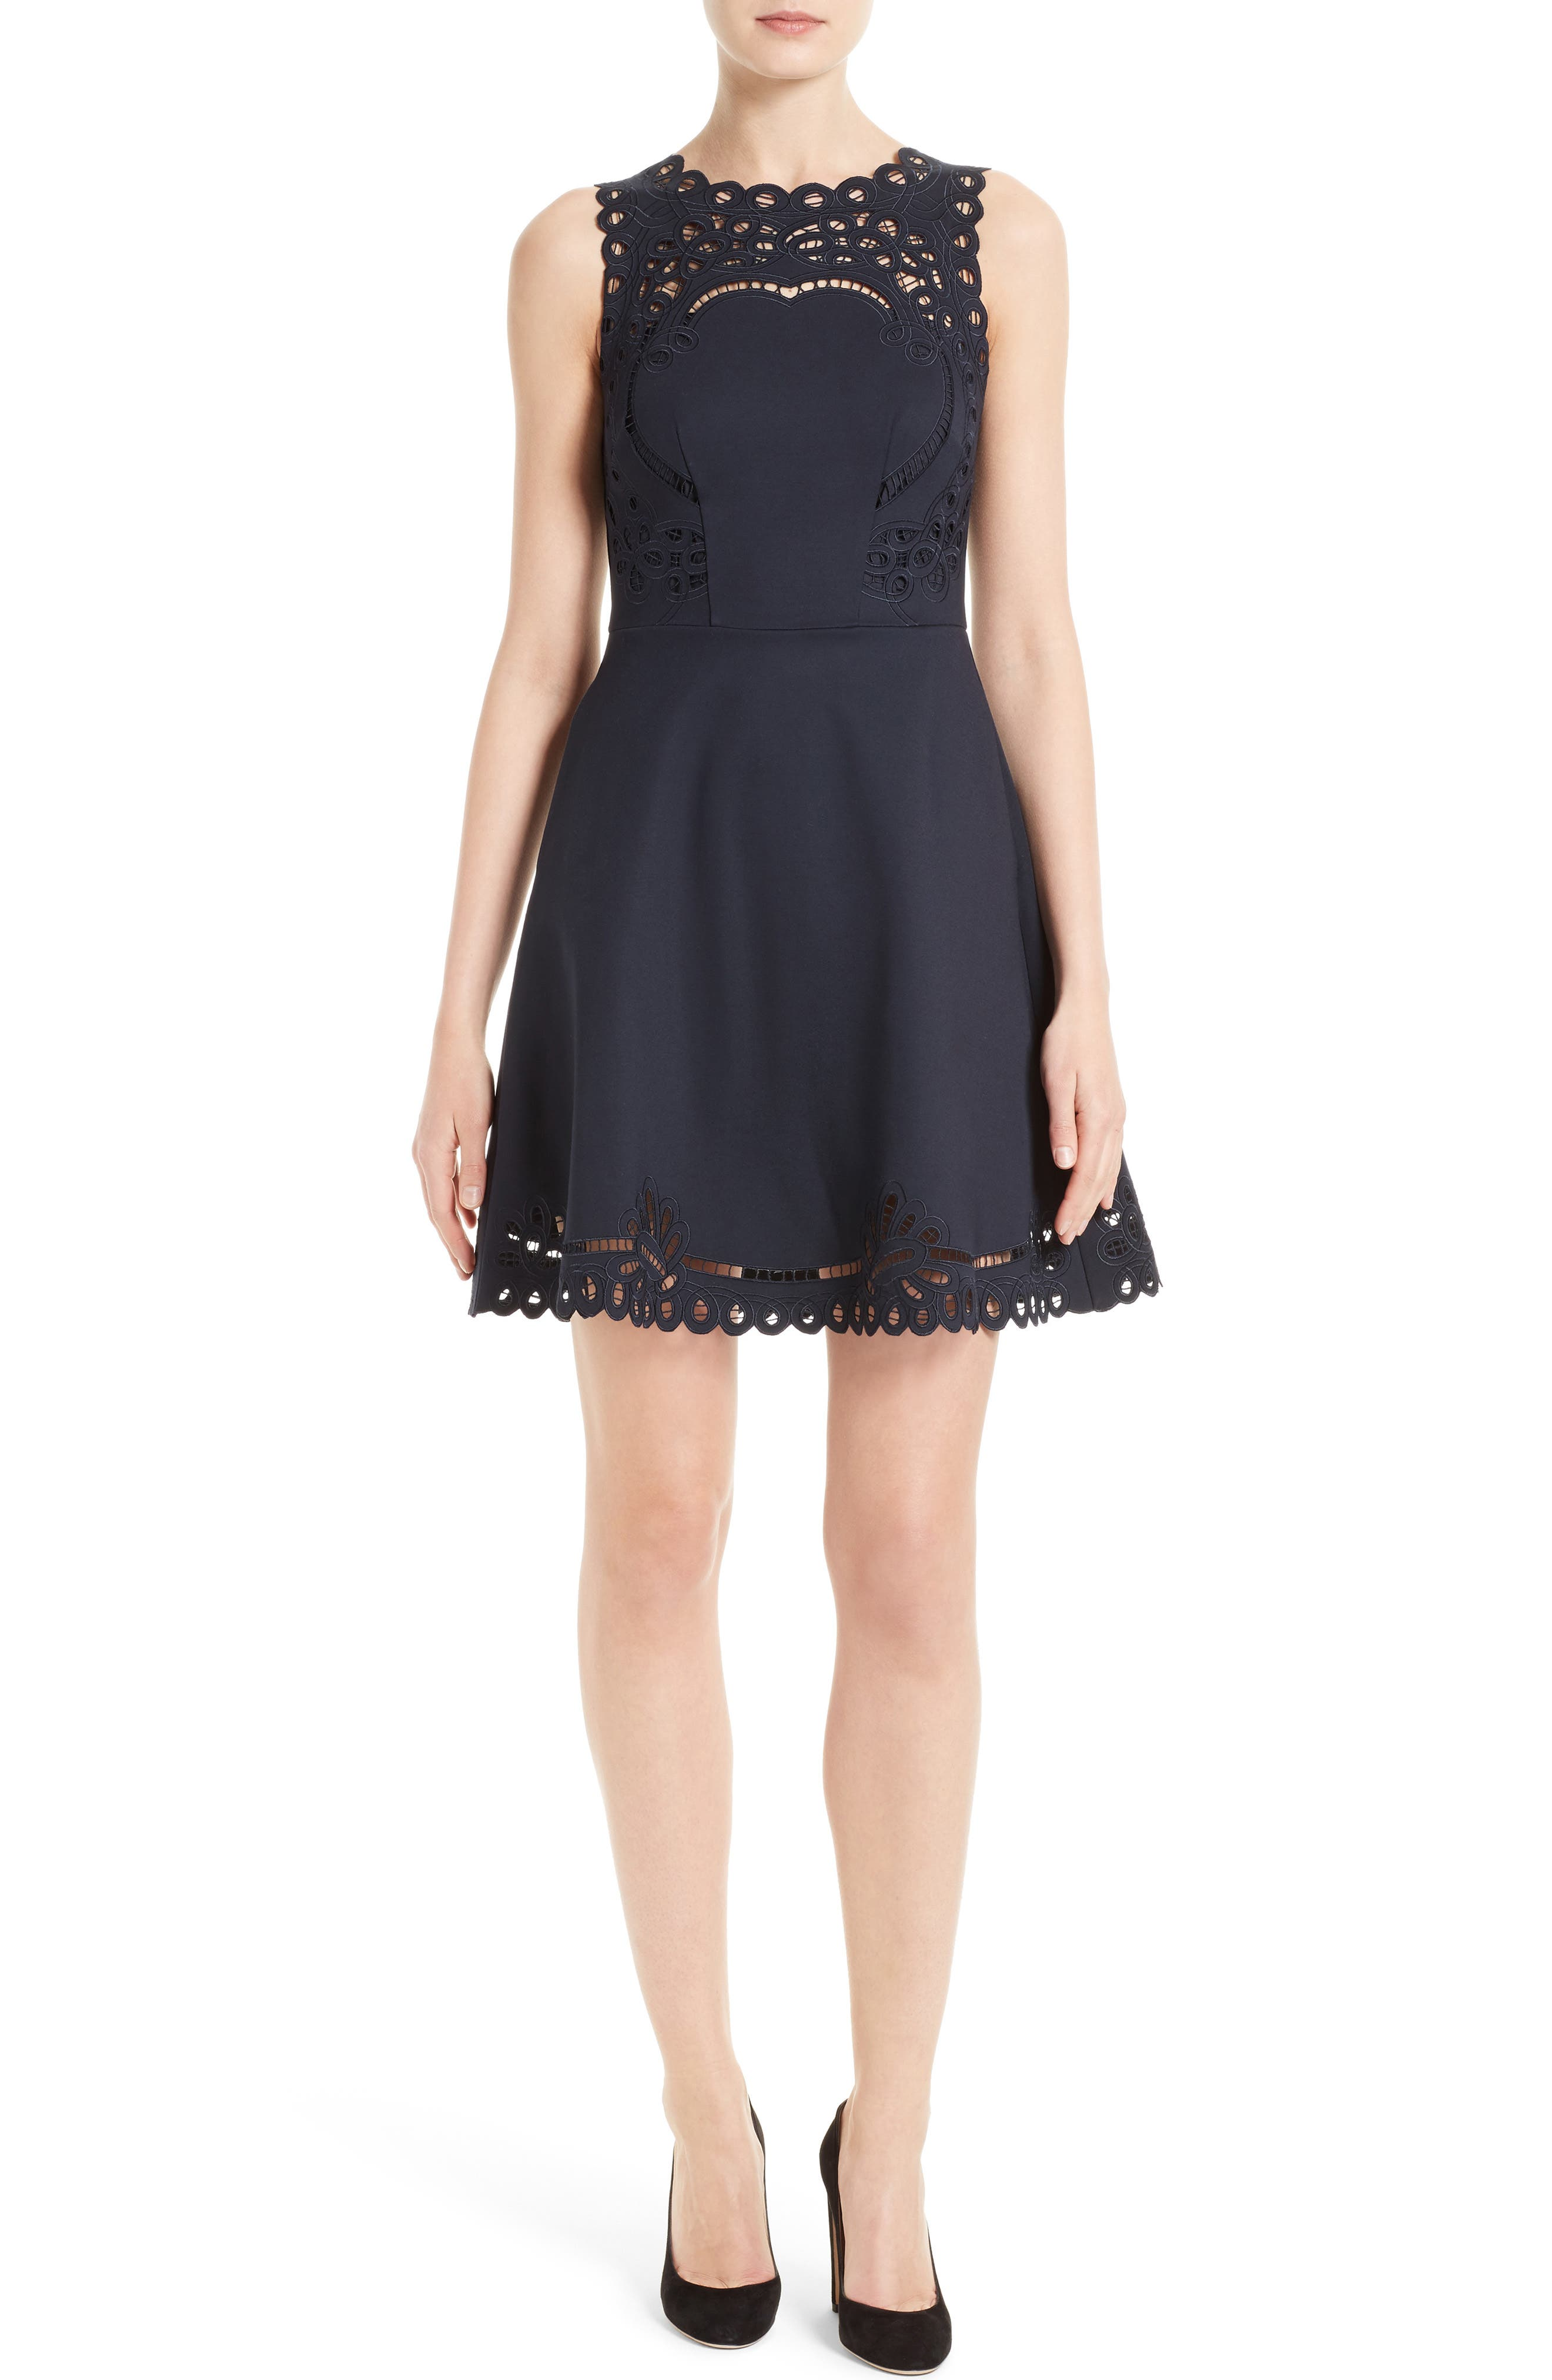 TED BAKER LONDON, Verony Eyelet Fit & Flare Dress, Main thumbnail 1, color, 402